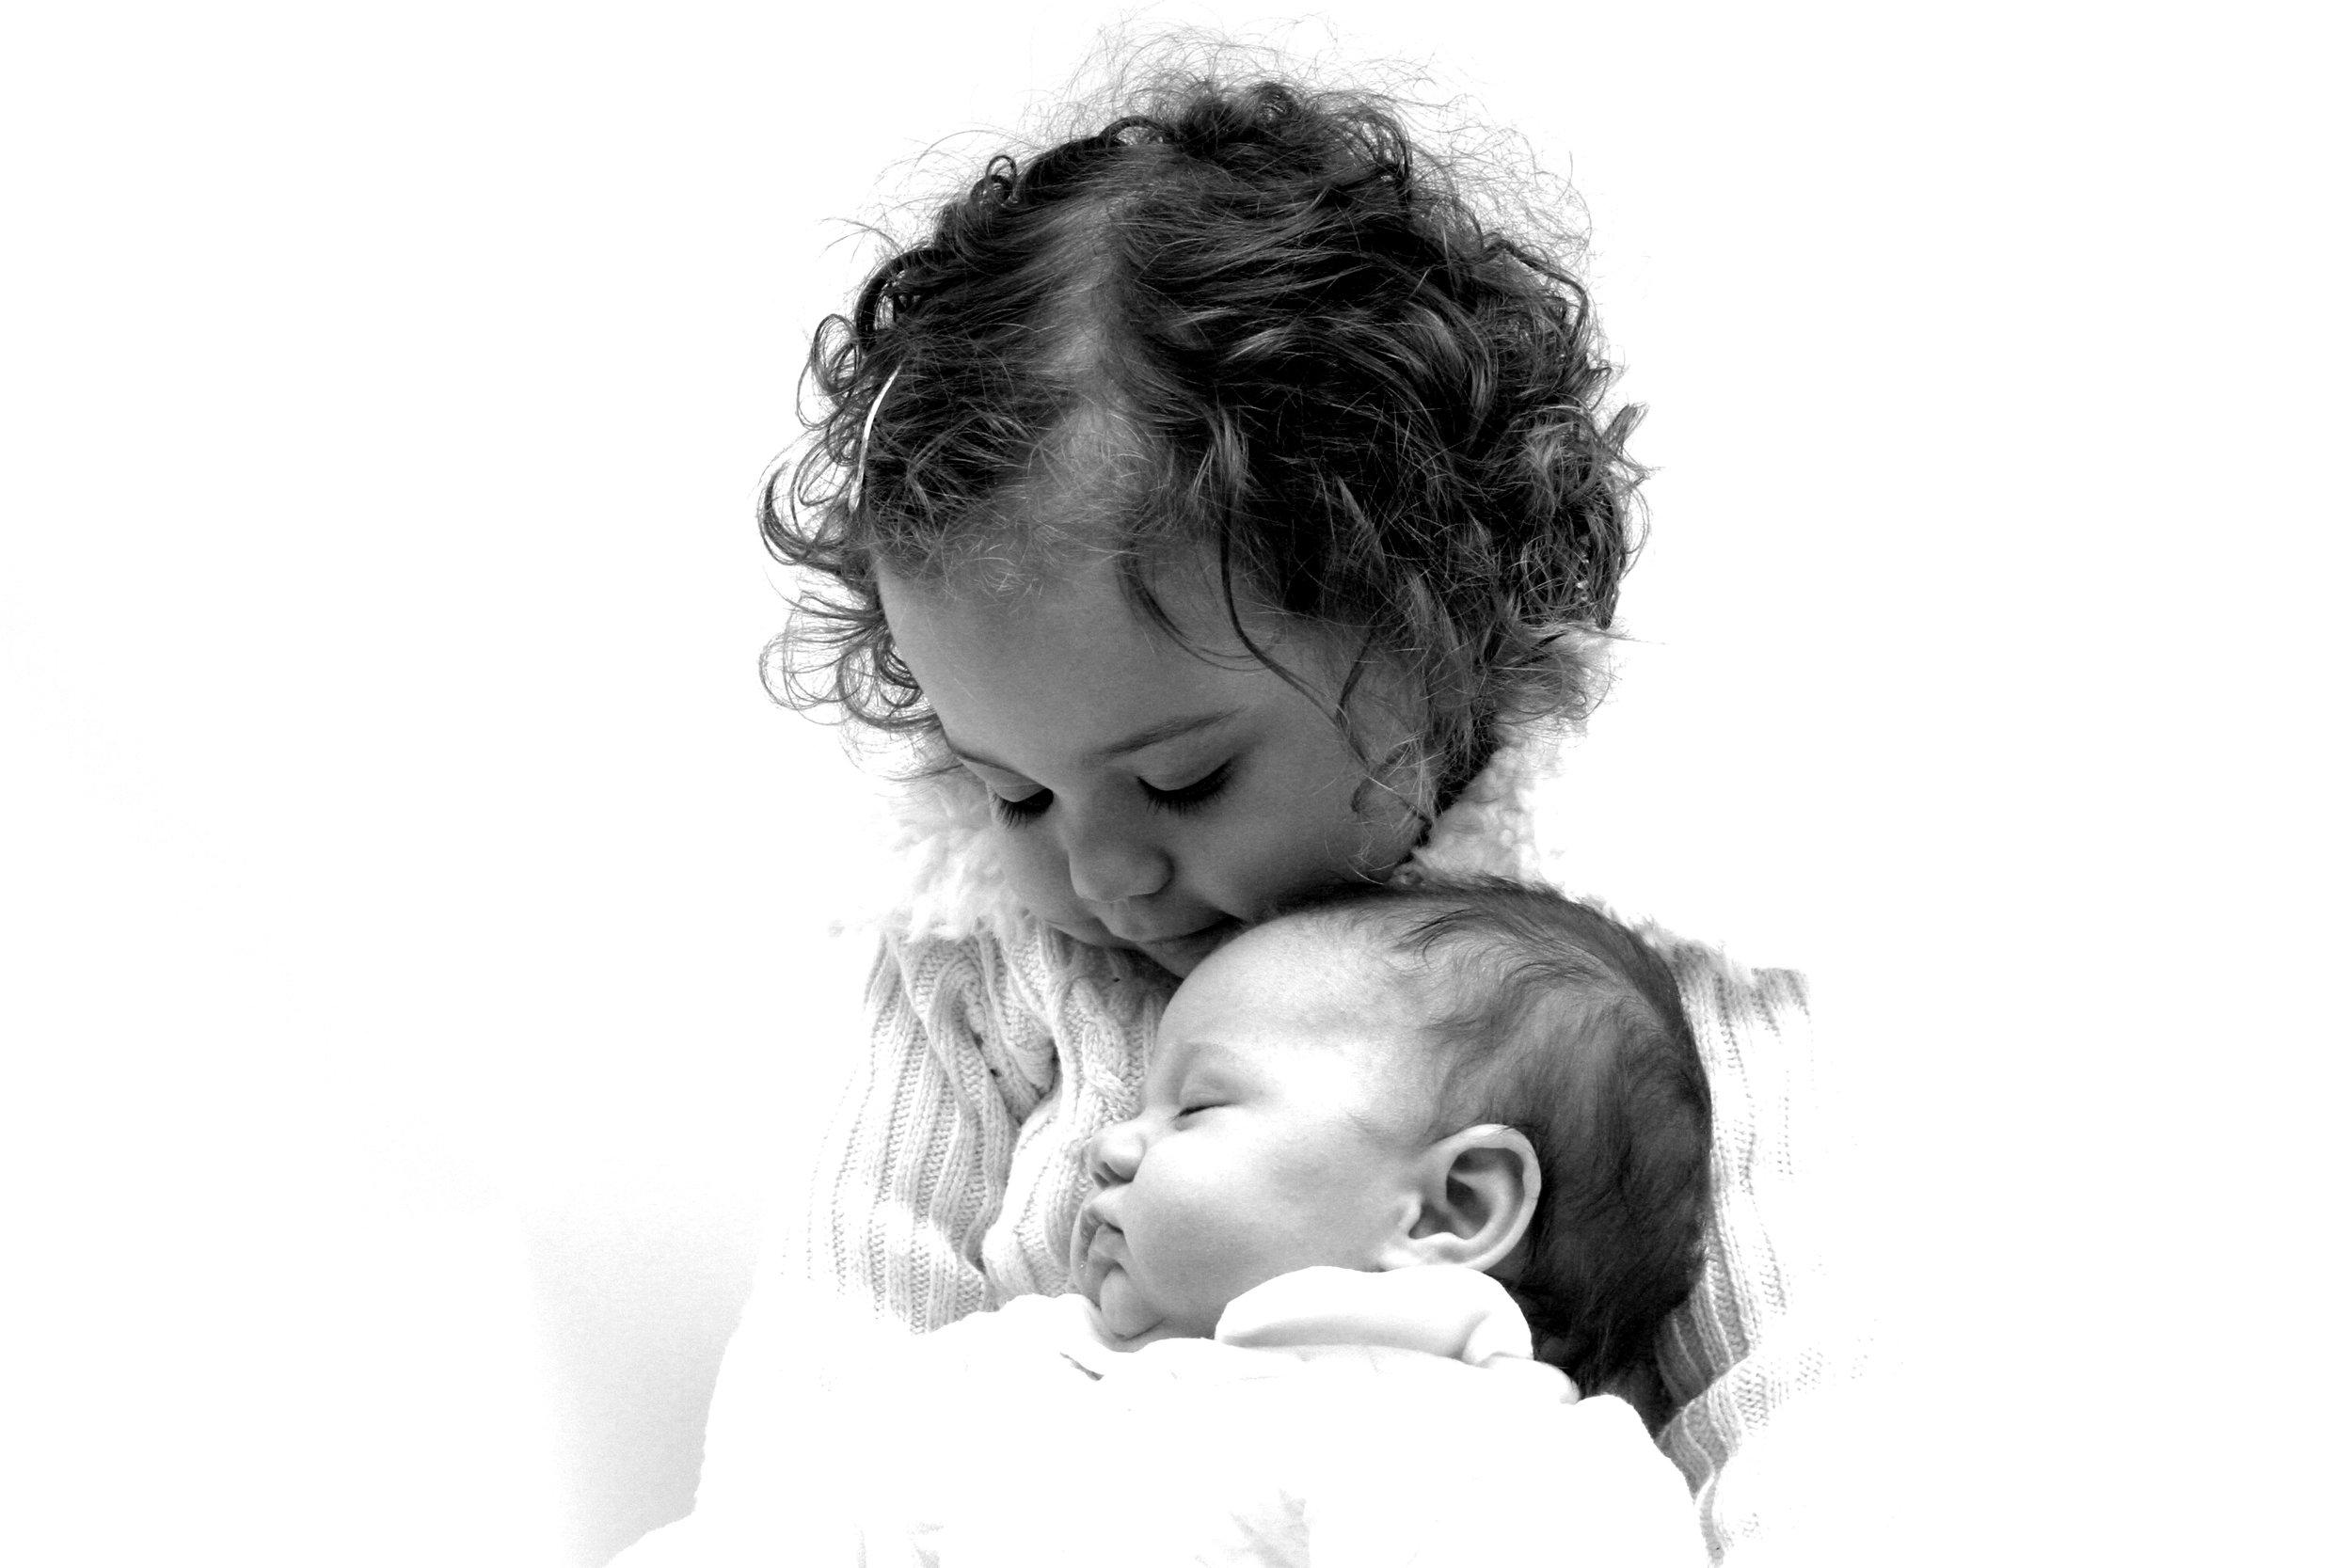 Newborn photoshoot, newborn infant baby photographer, photographers sibling family